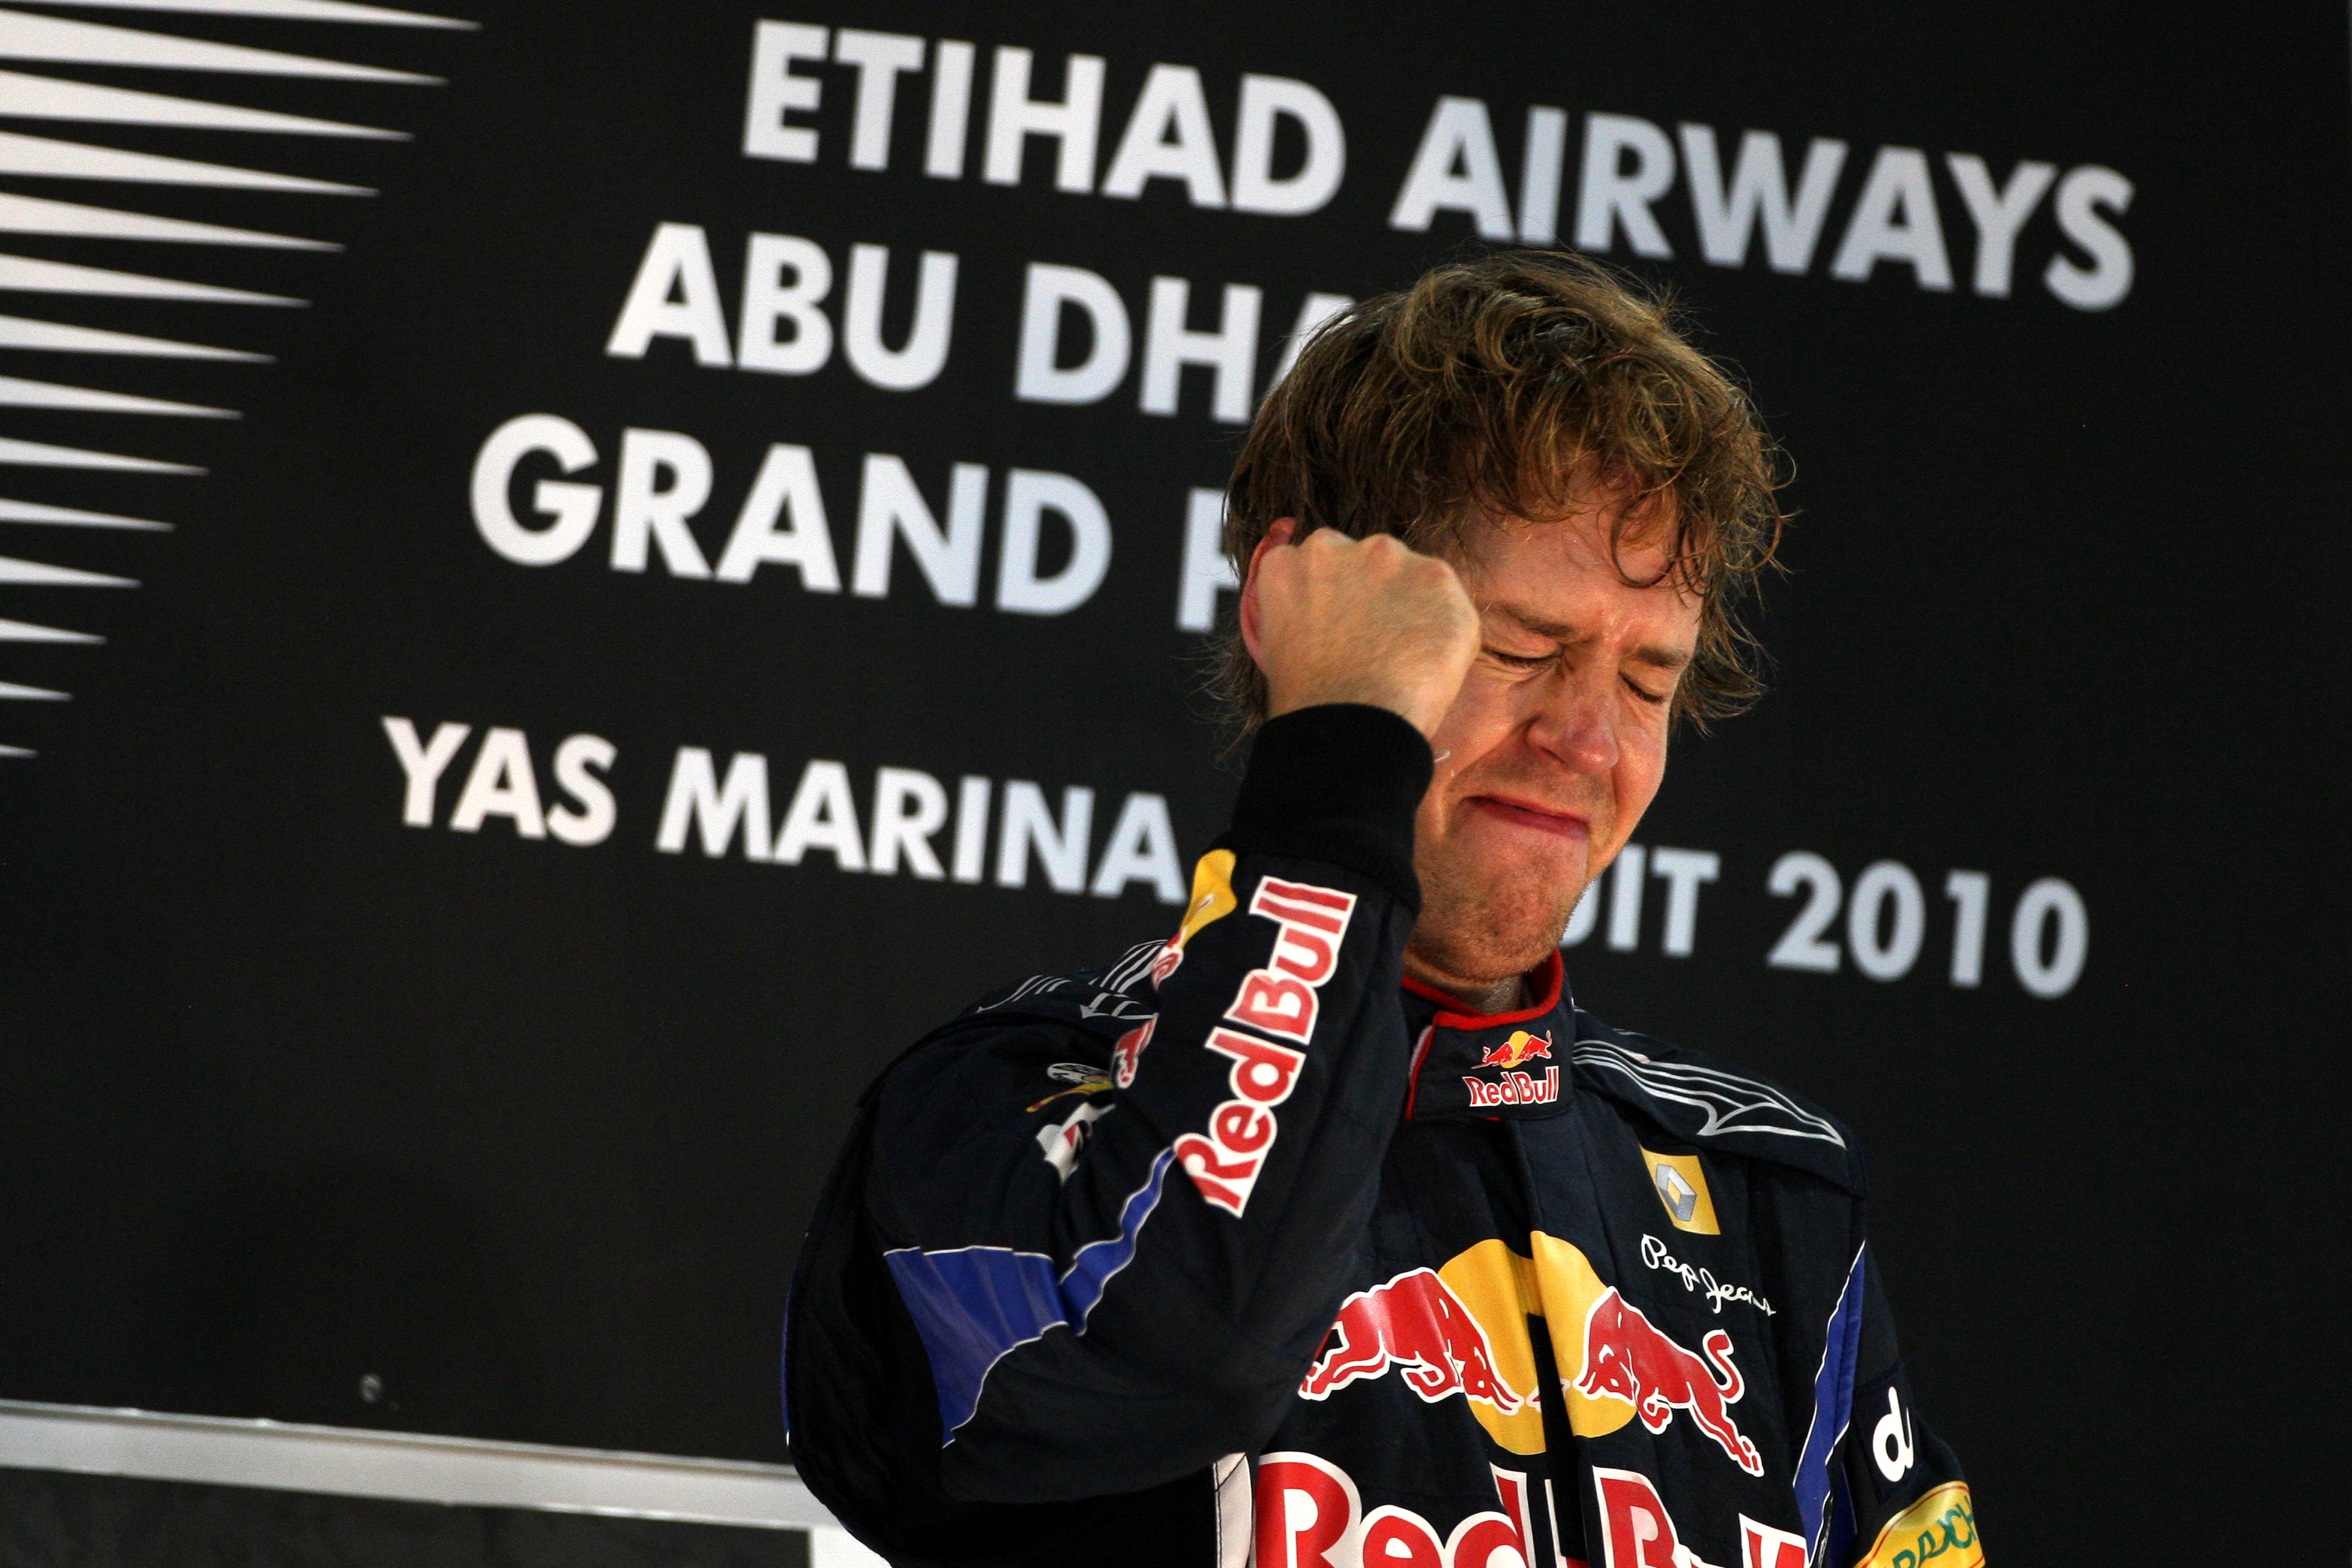 Formula 1 Grand Prix, Abu Dhabi, Sunday Podium